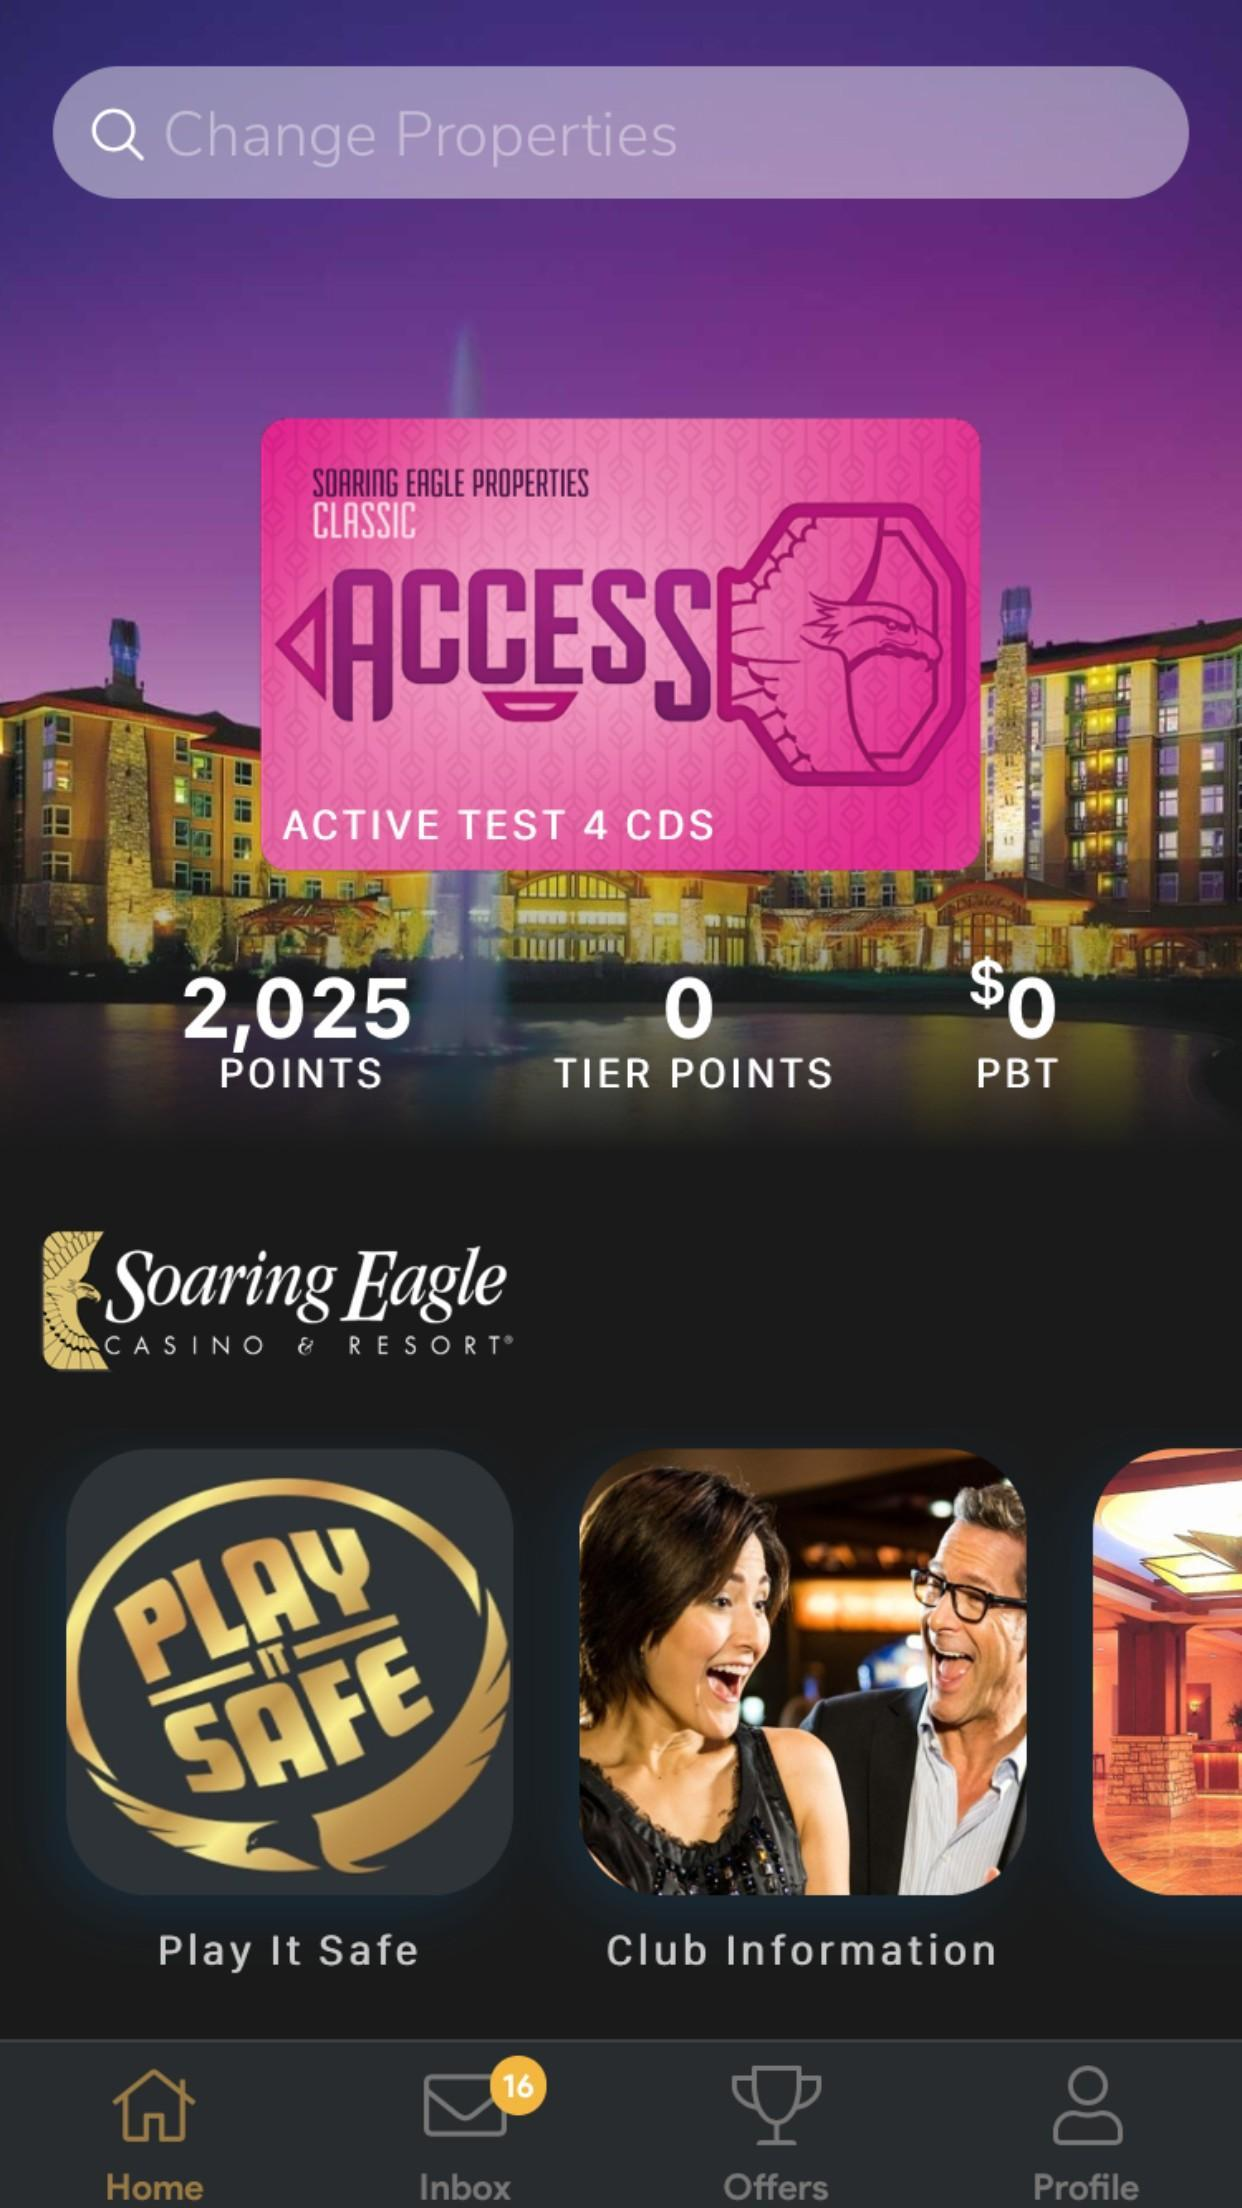 Soaring eagle casino restaurant coupons casino hotel prince albert saskatchewan